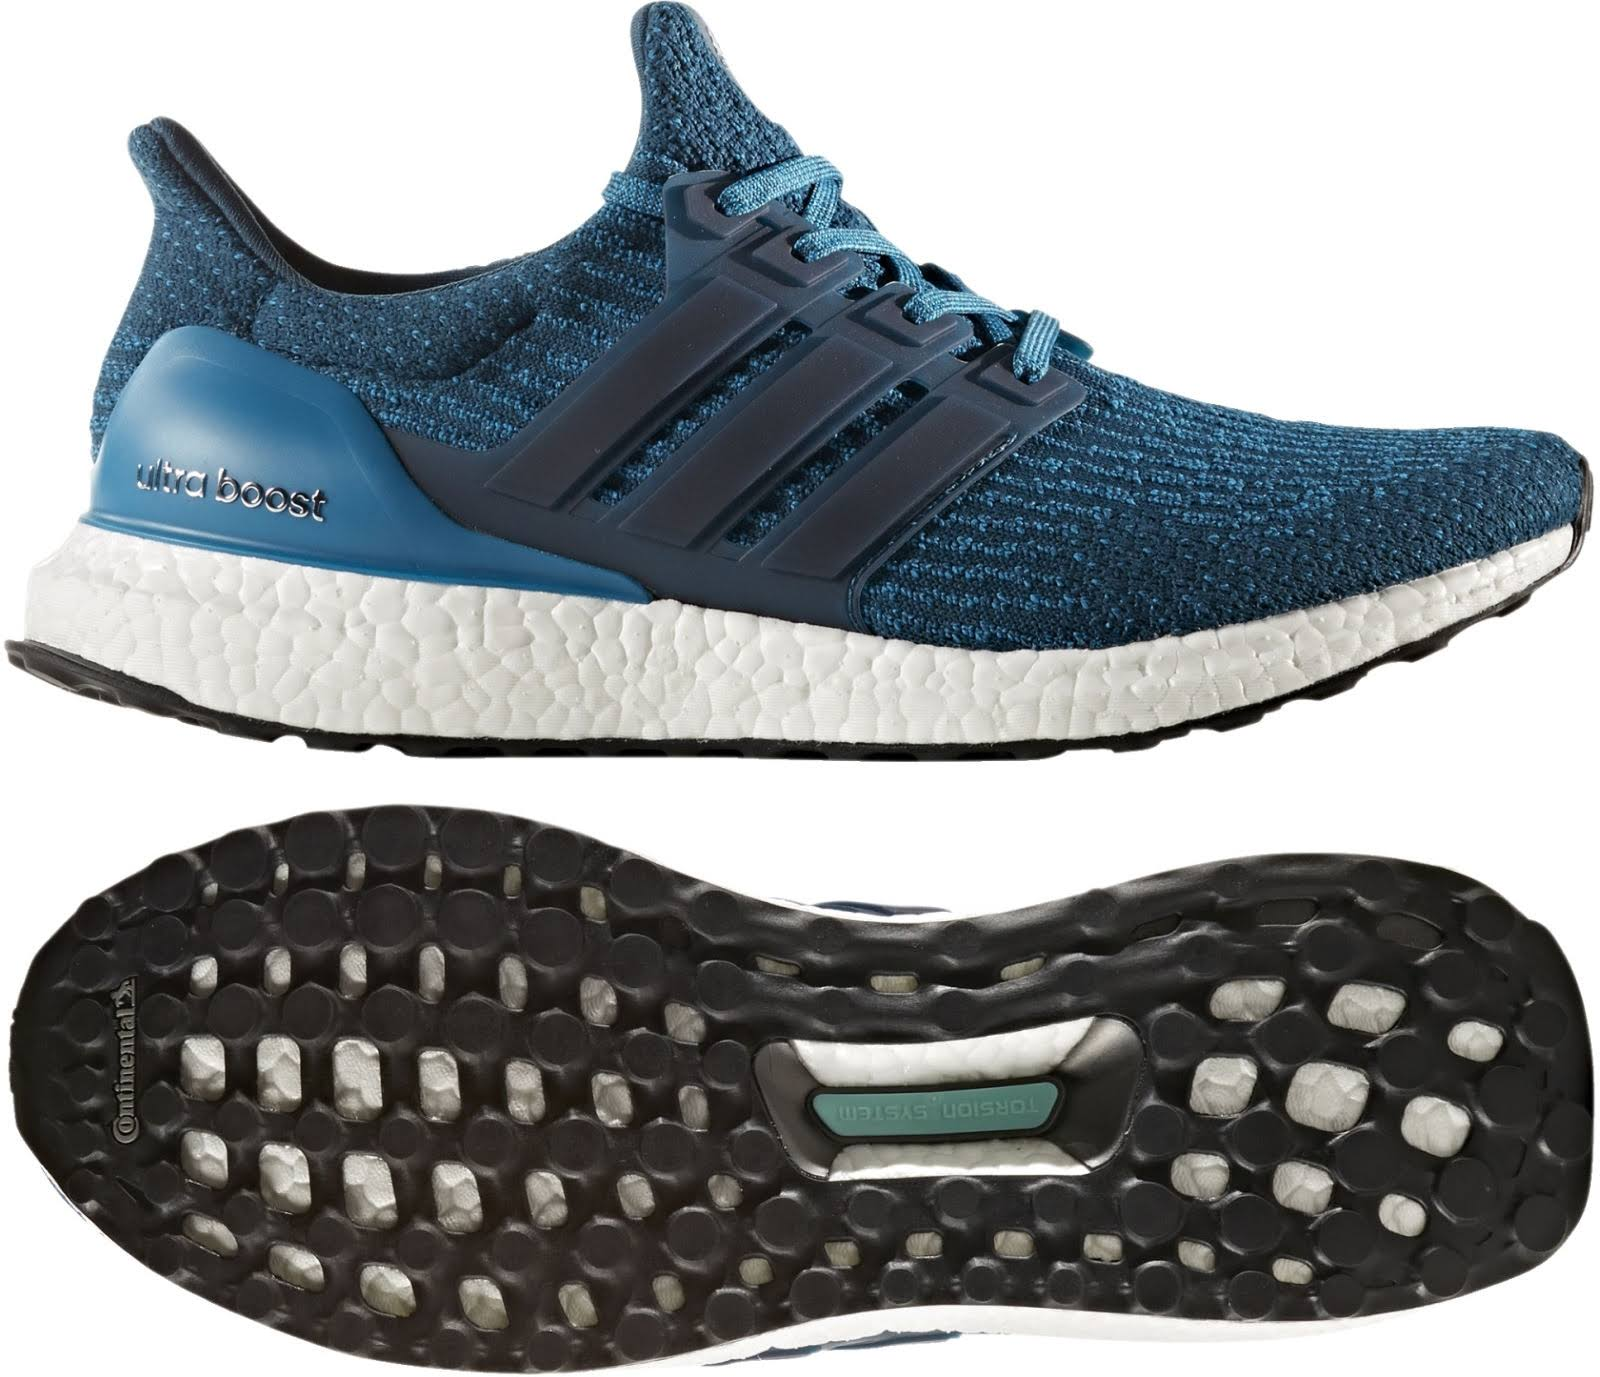 Mystery Correr 10 5 Hombre Para Uk Ultraboost Blue Adidas Zapatillas Aw17 zxYAn